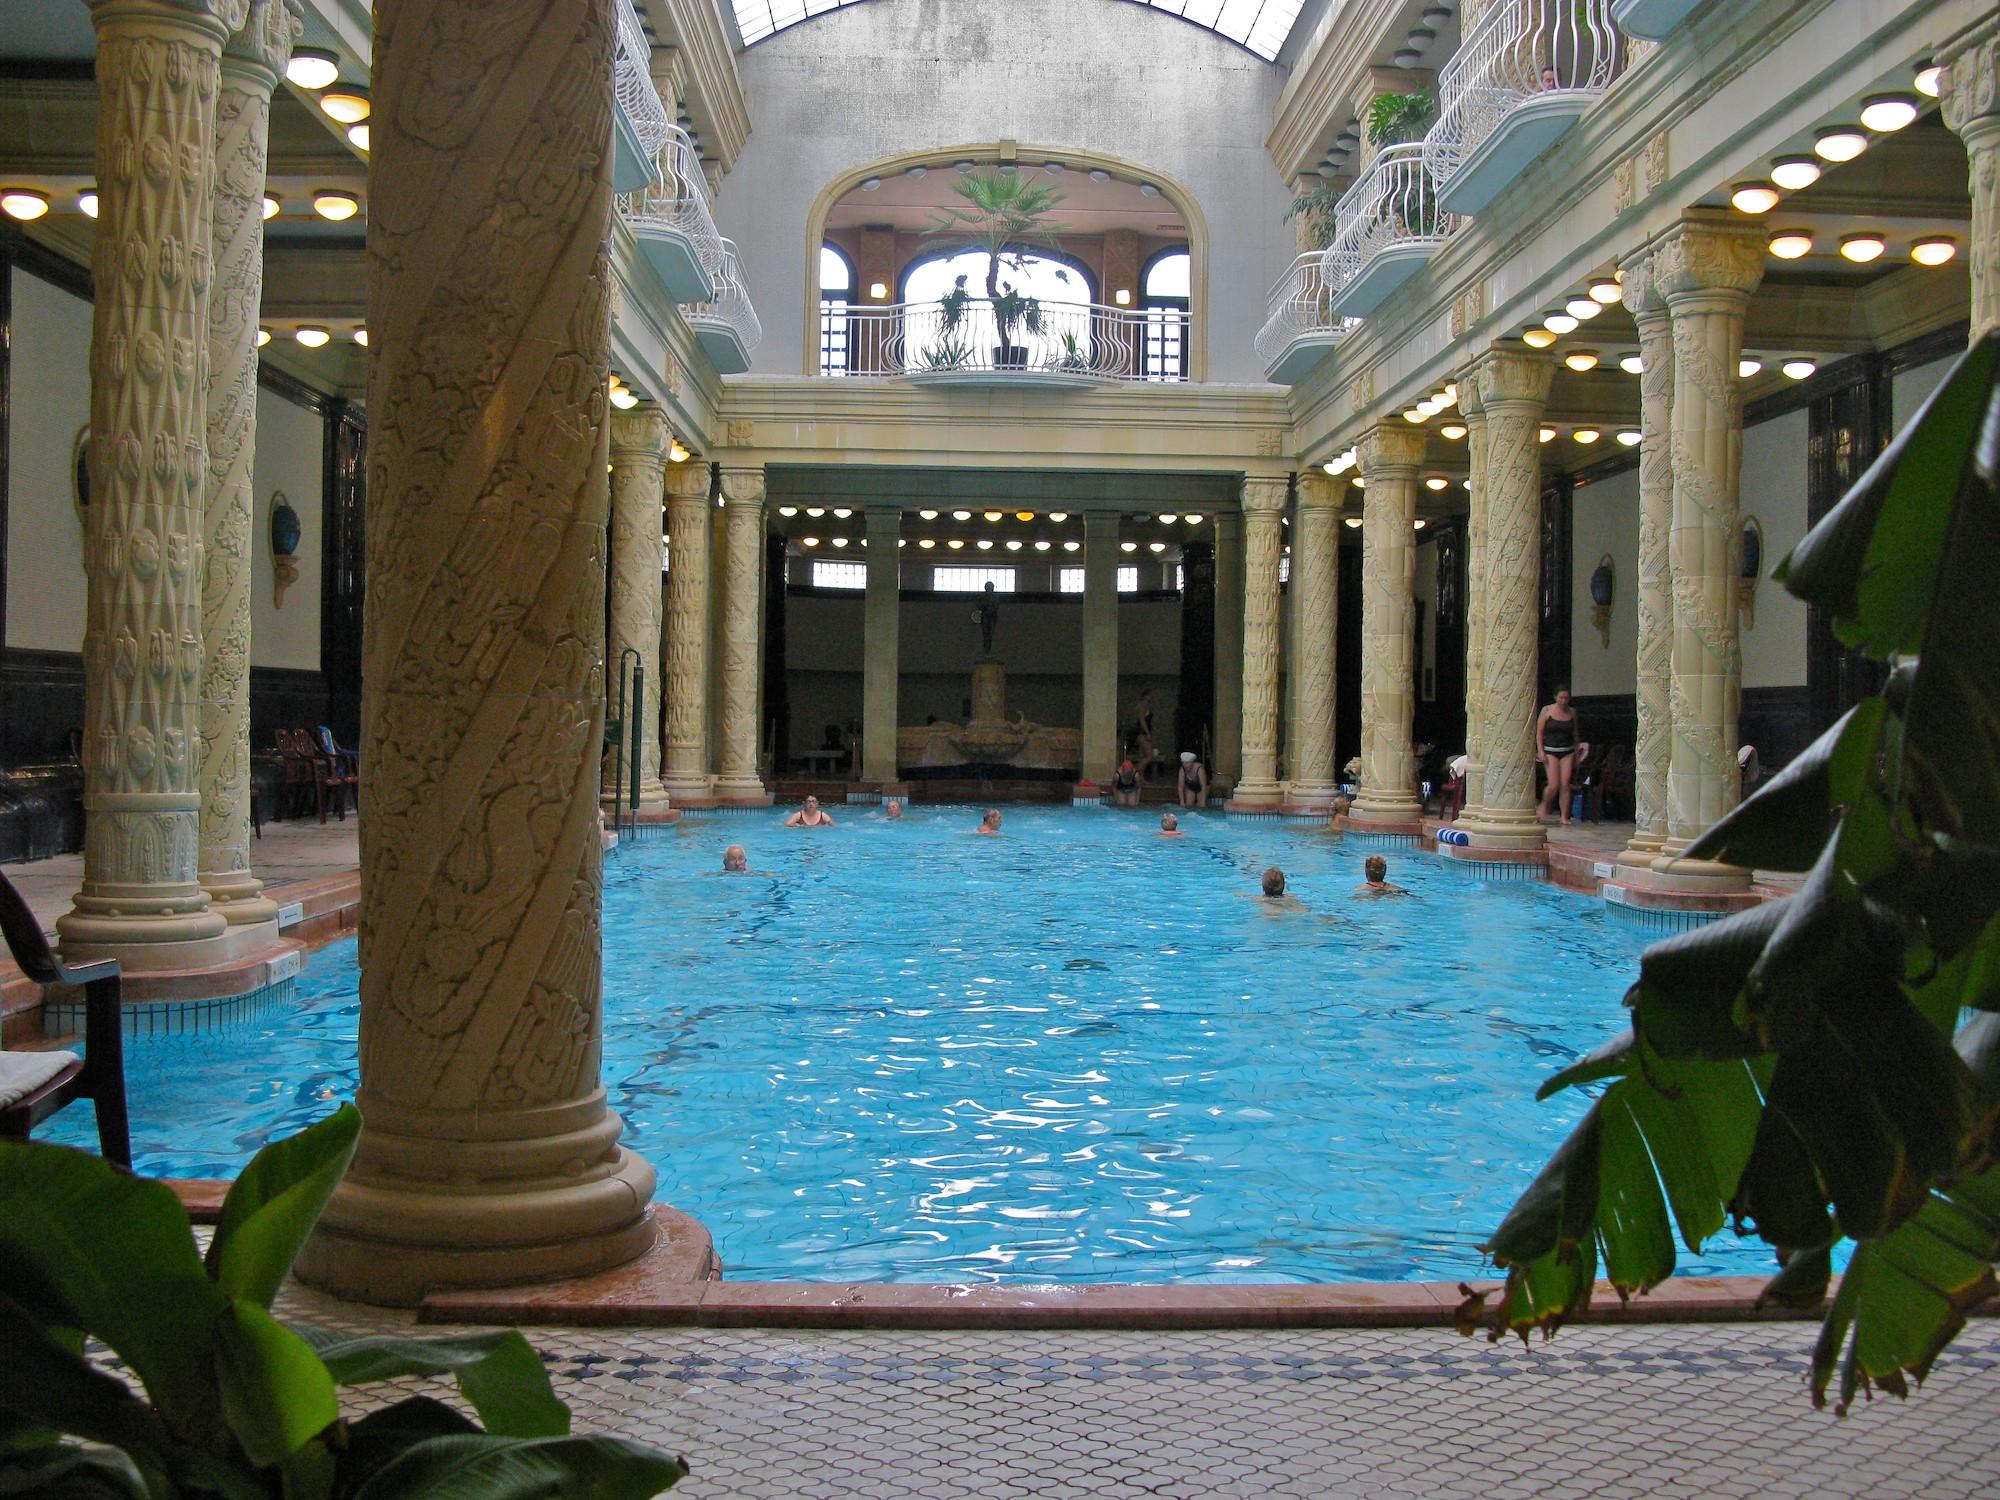 Gellért Baths - Amazing Sight-Seeing Destinations in Budapest (Hungary)